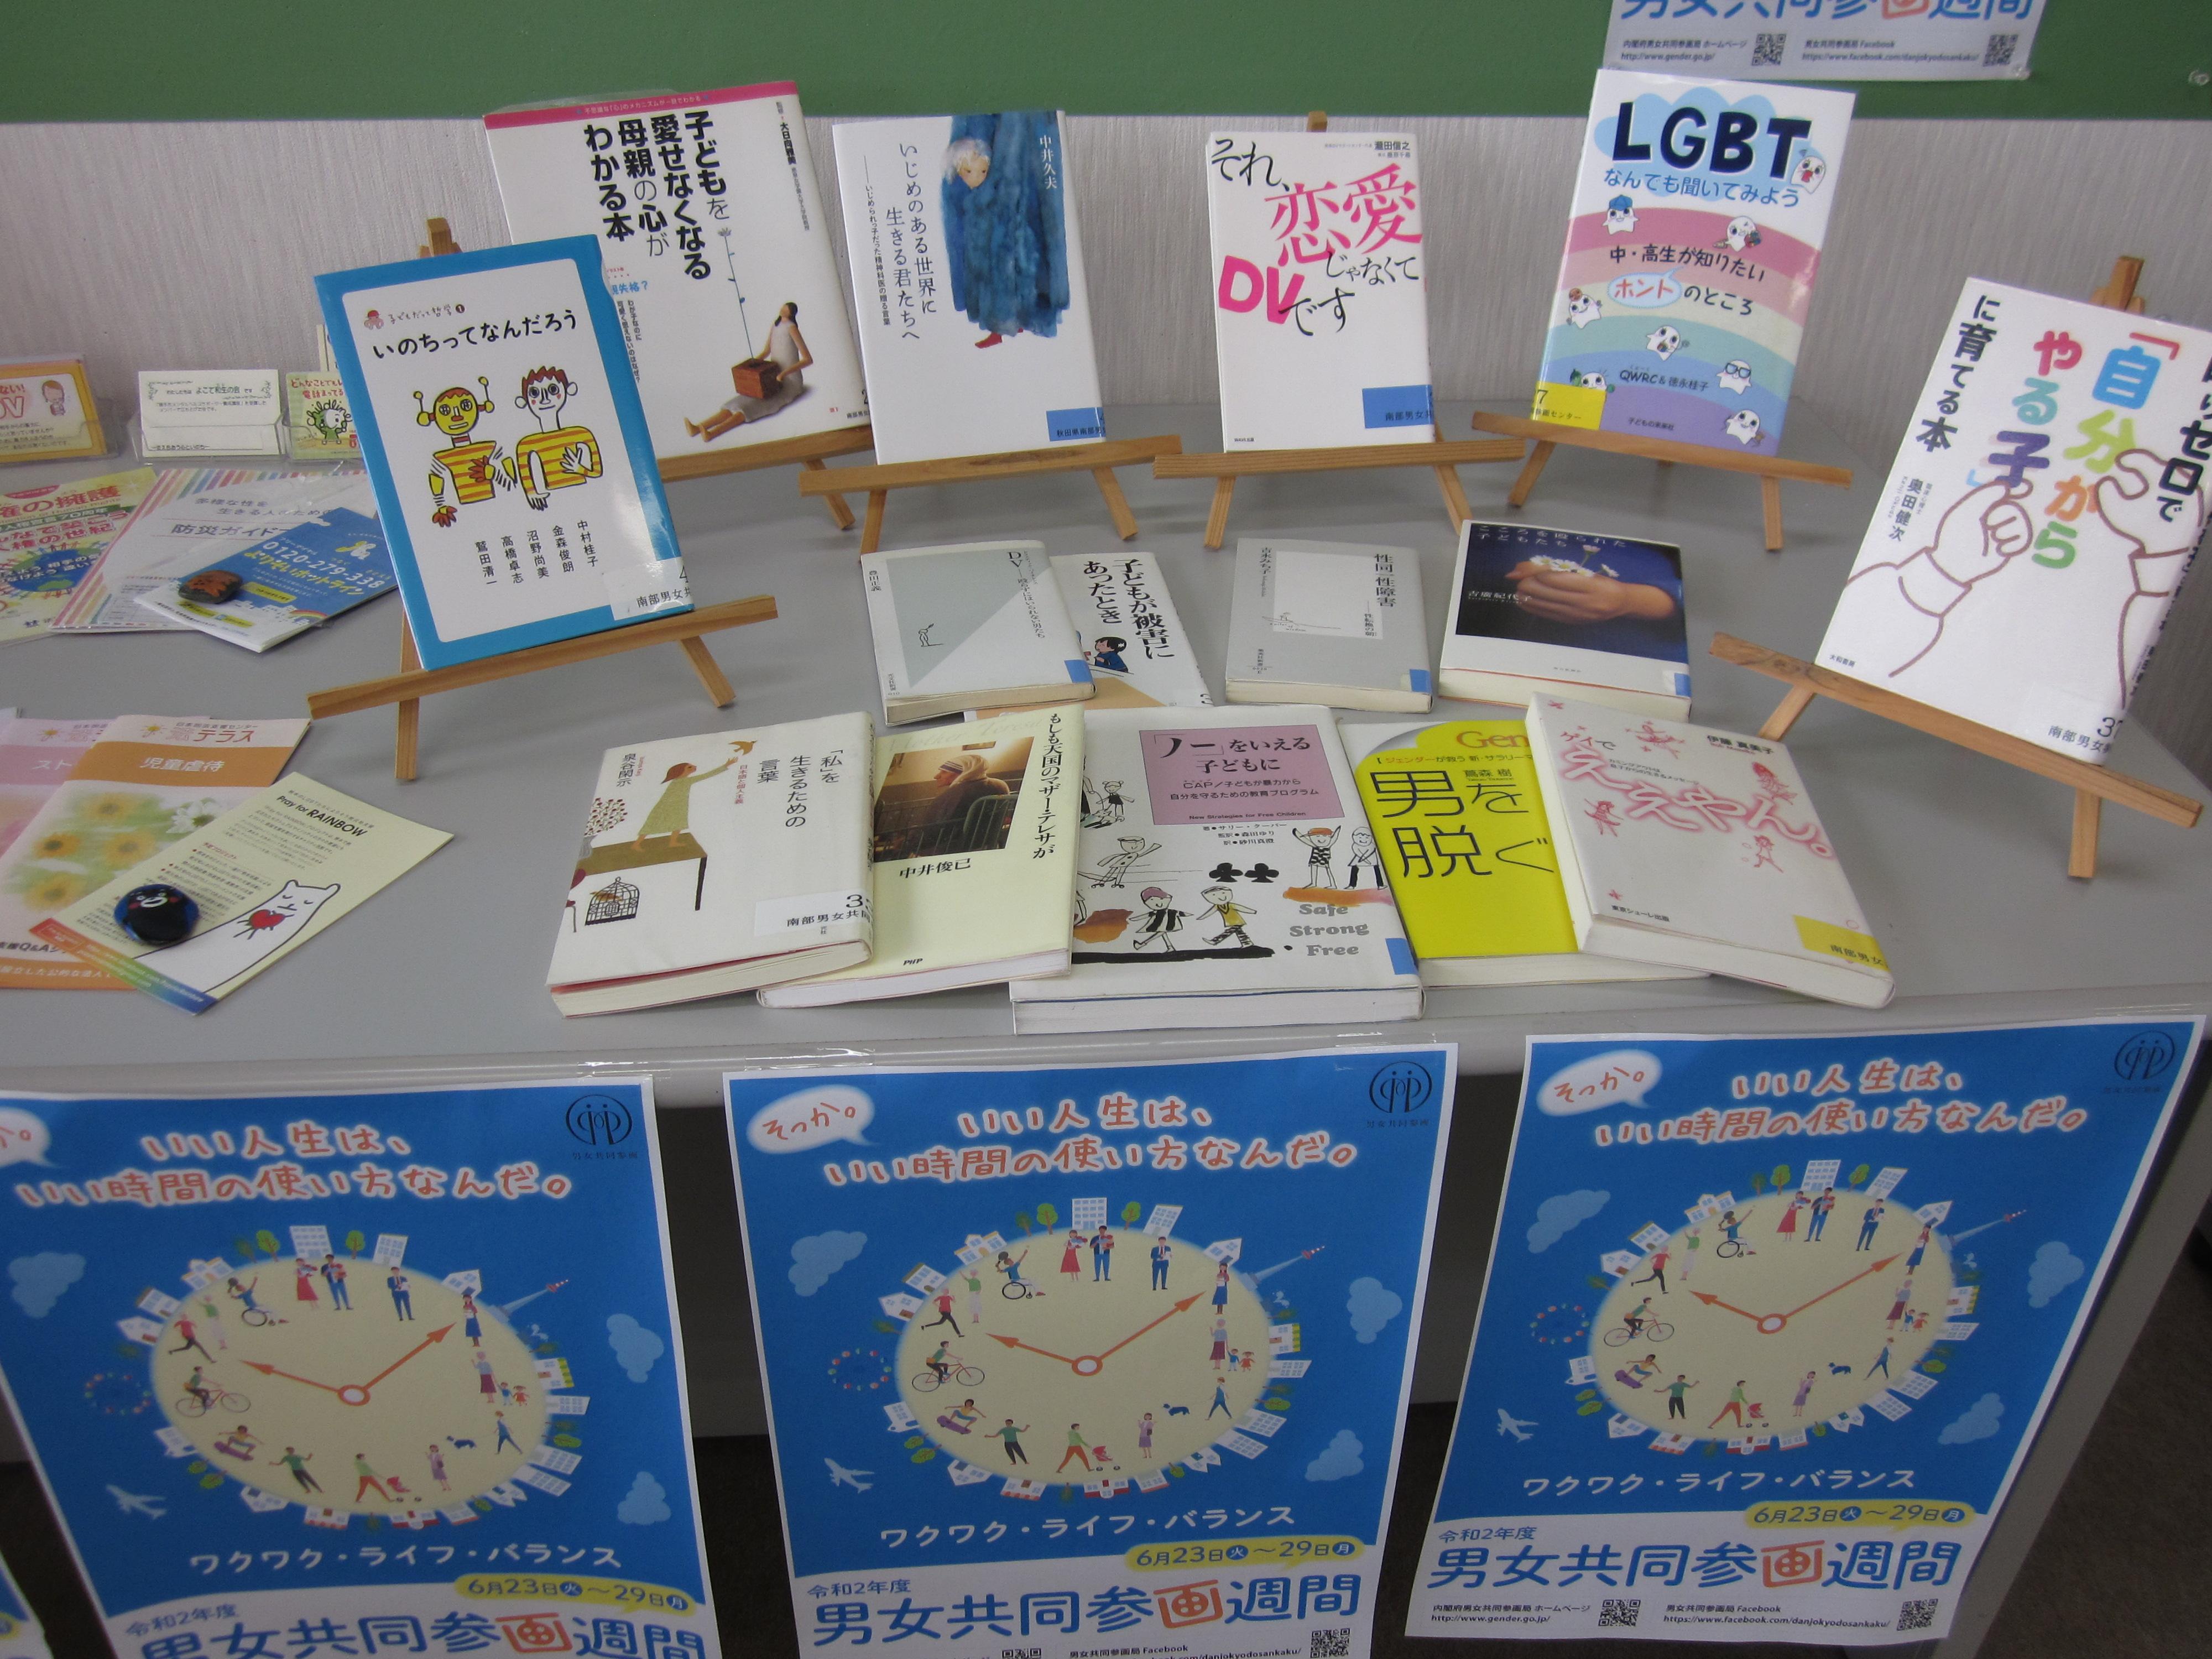 http://www.akita-south-jender.org/news/IMG_0152.JPG